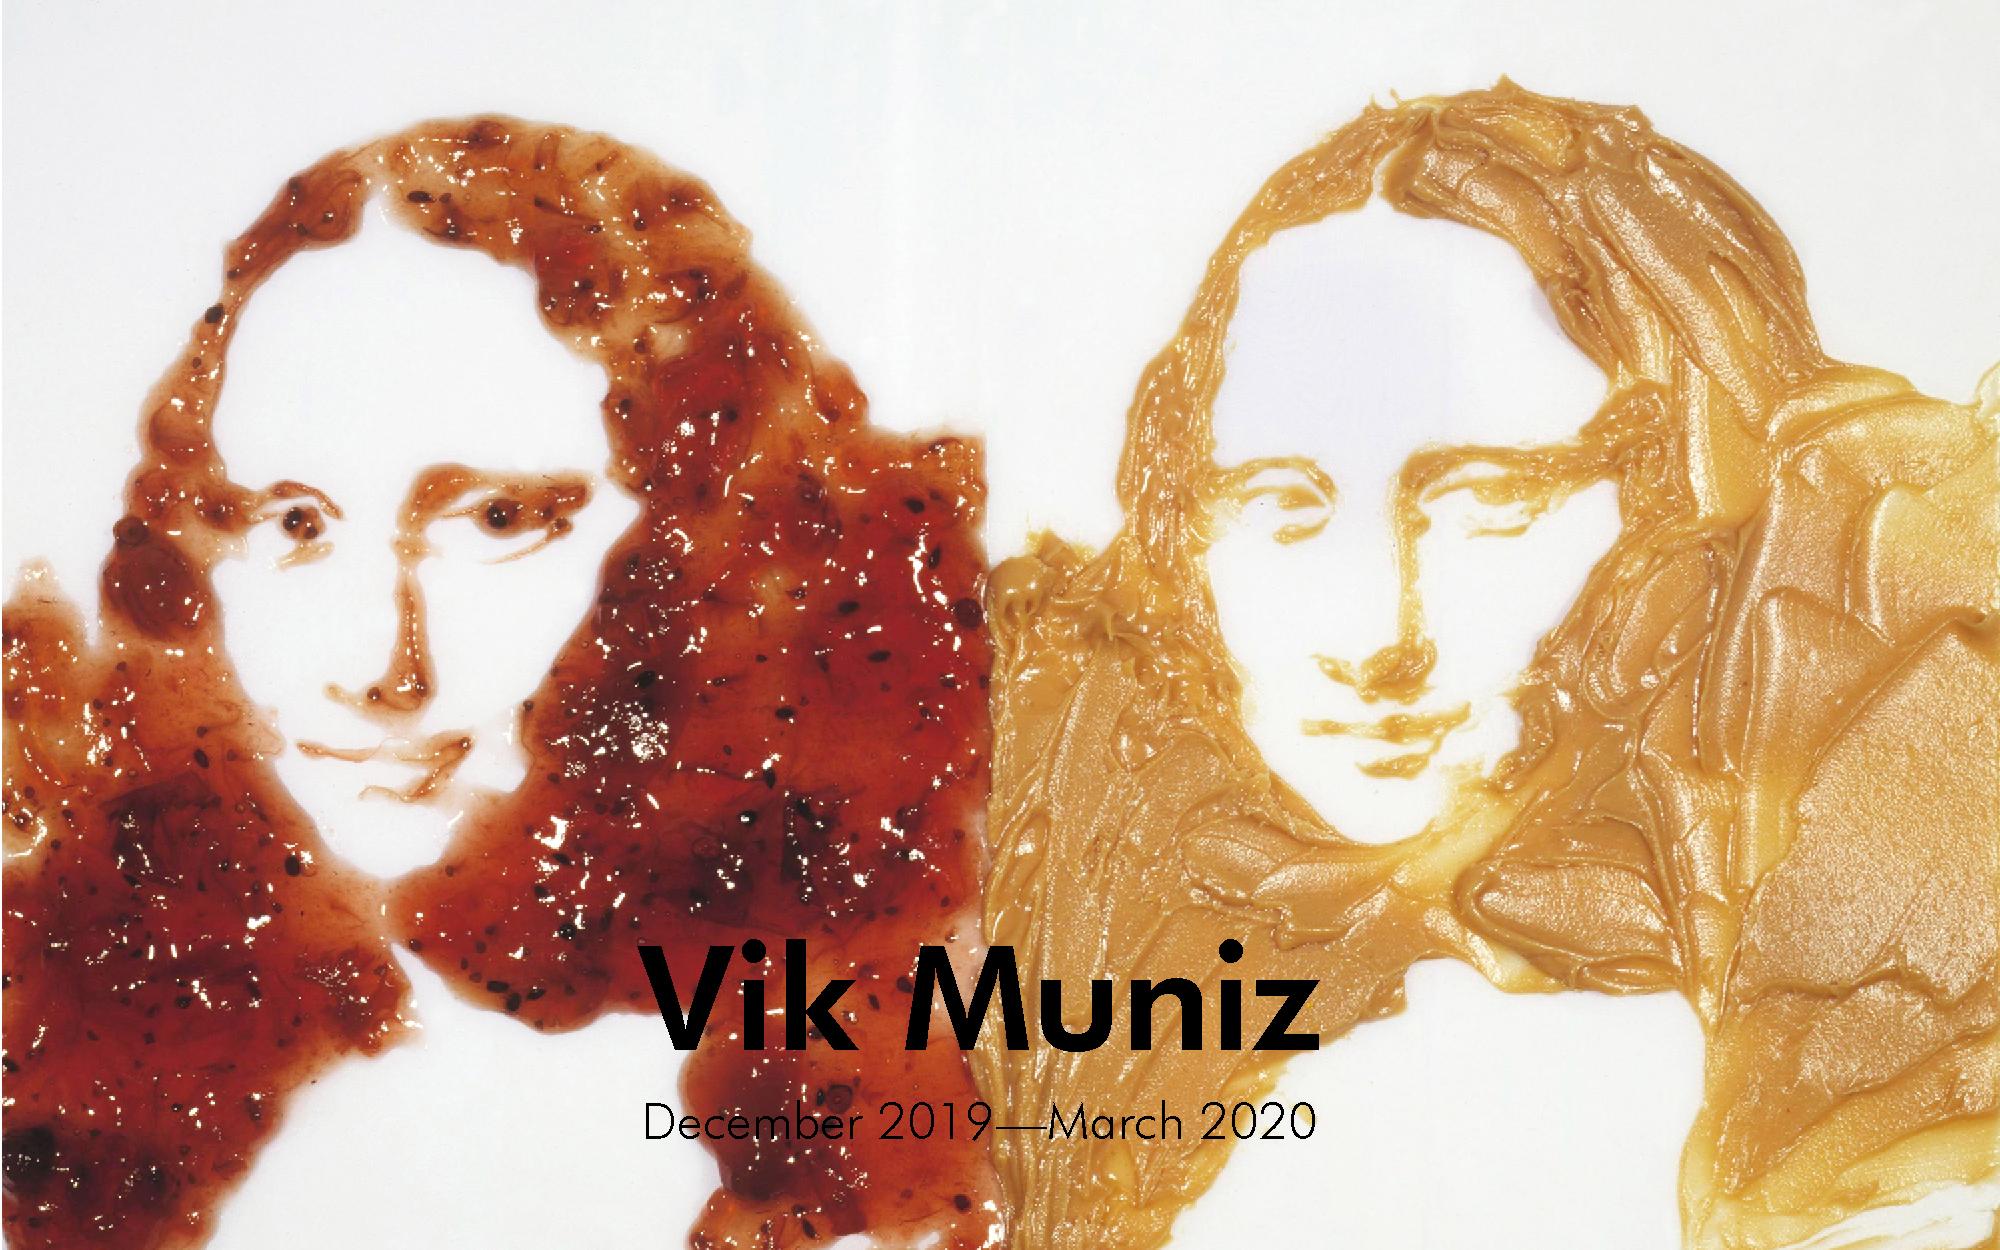 Vik Muniz, Double Mona Lisa (Peanut Butter and Jelly)(1999)